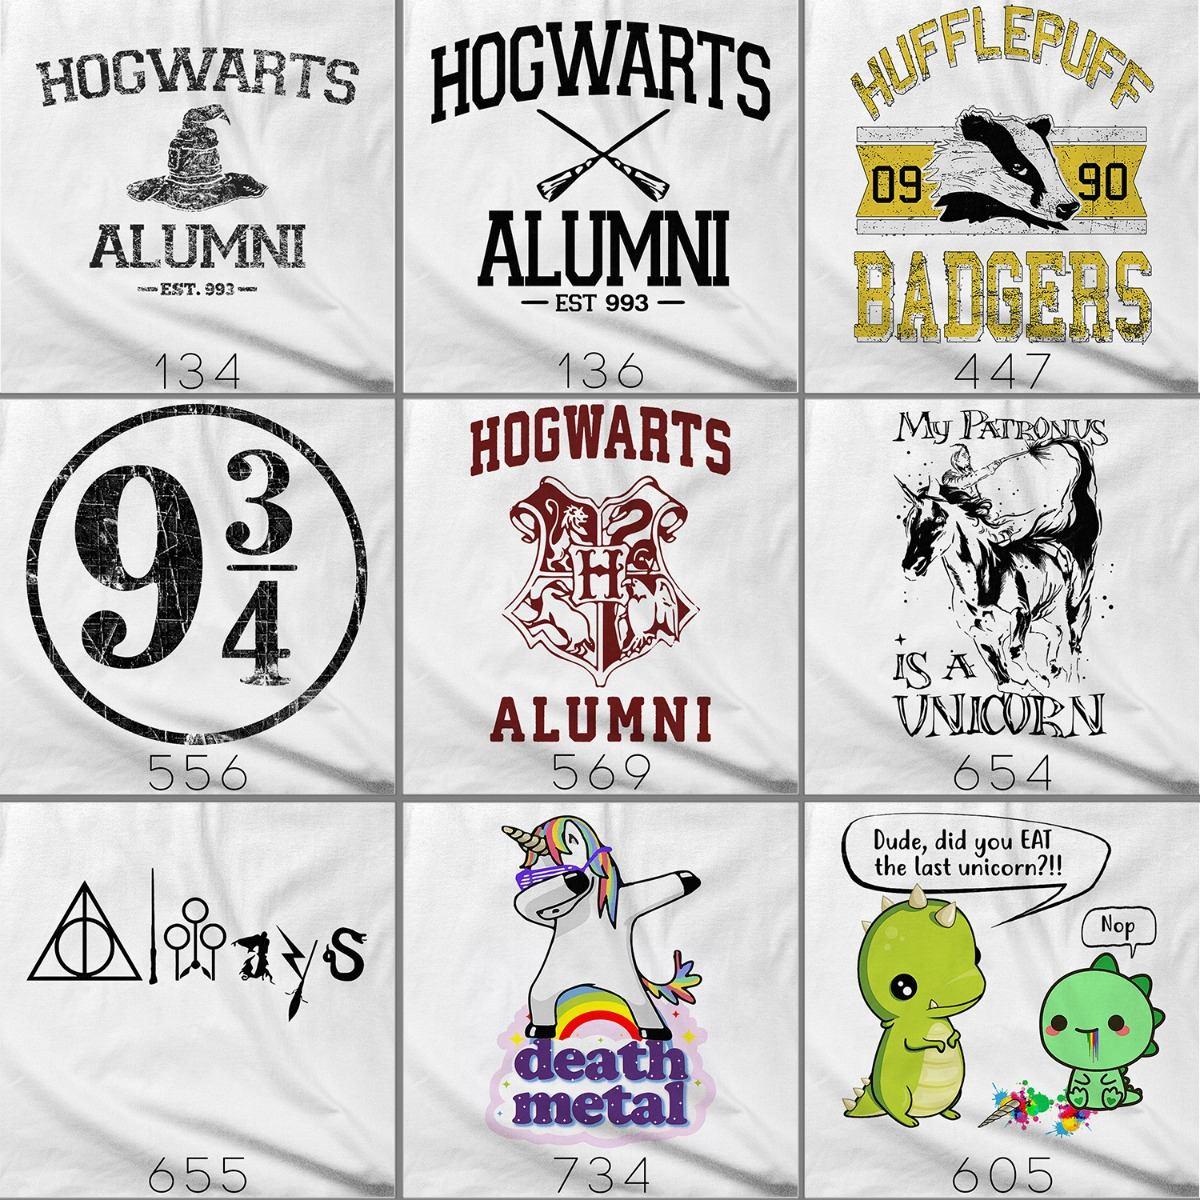 Camiseta 3 4 Camisa Estacao 9 3 4 Harry Potter Blusa Tumblr R